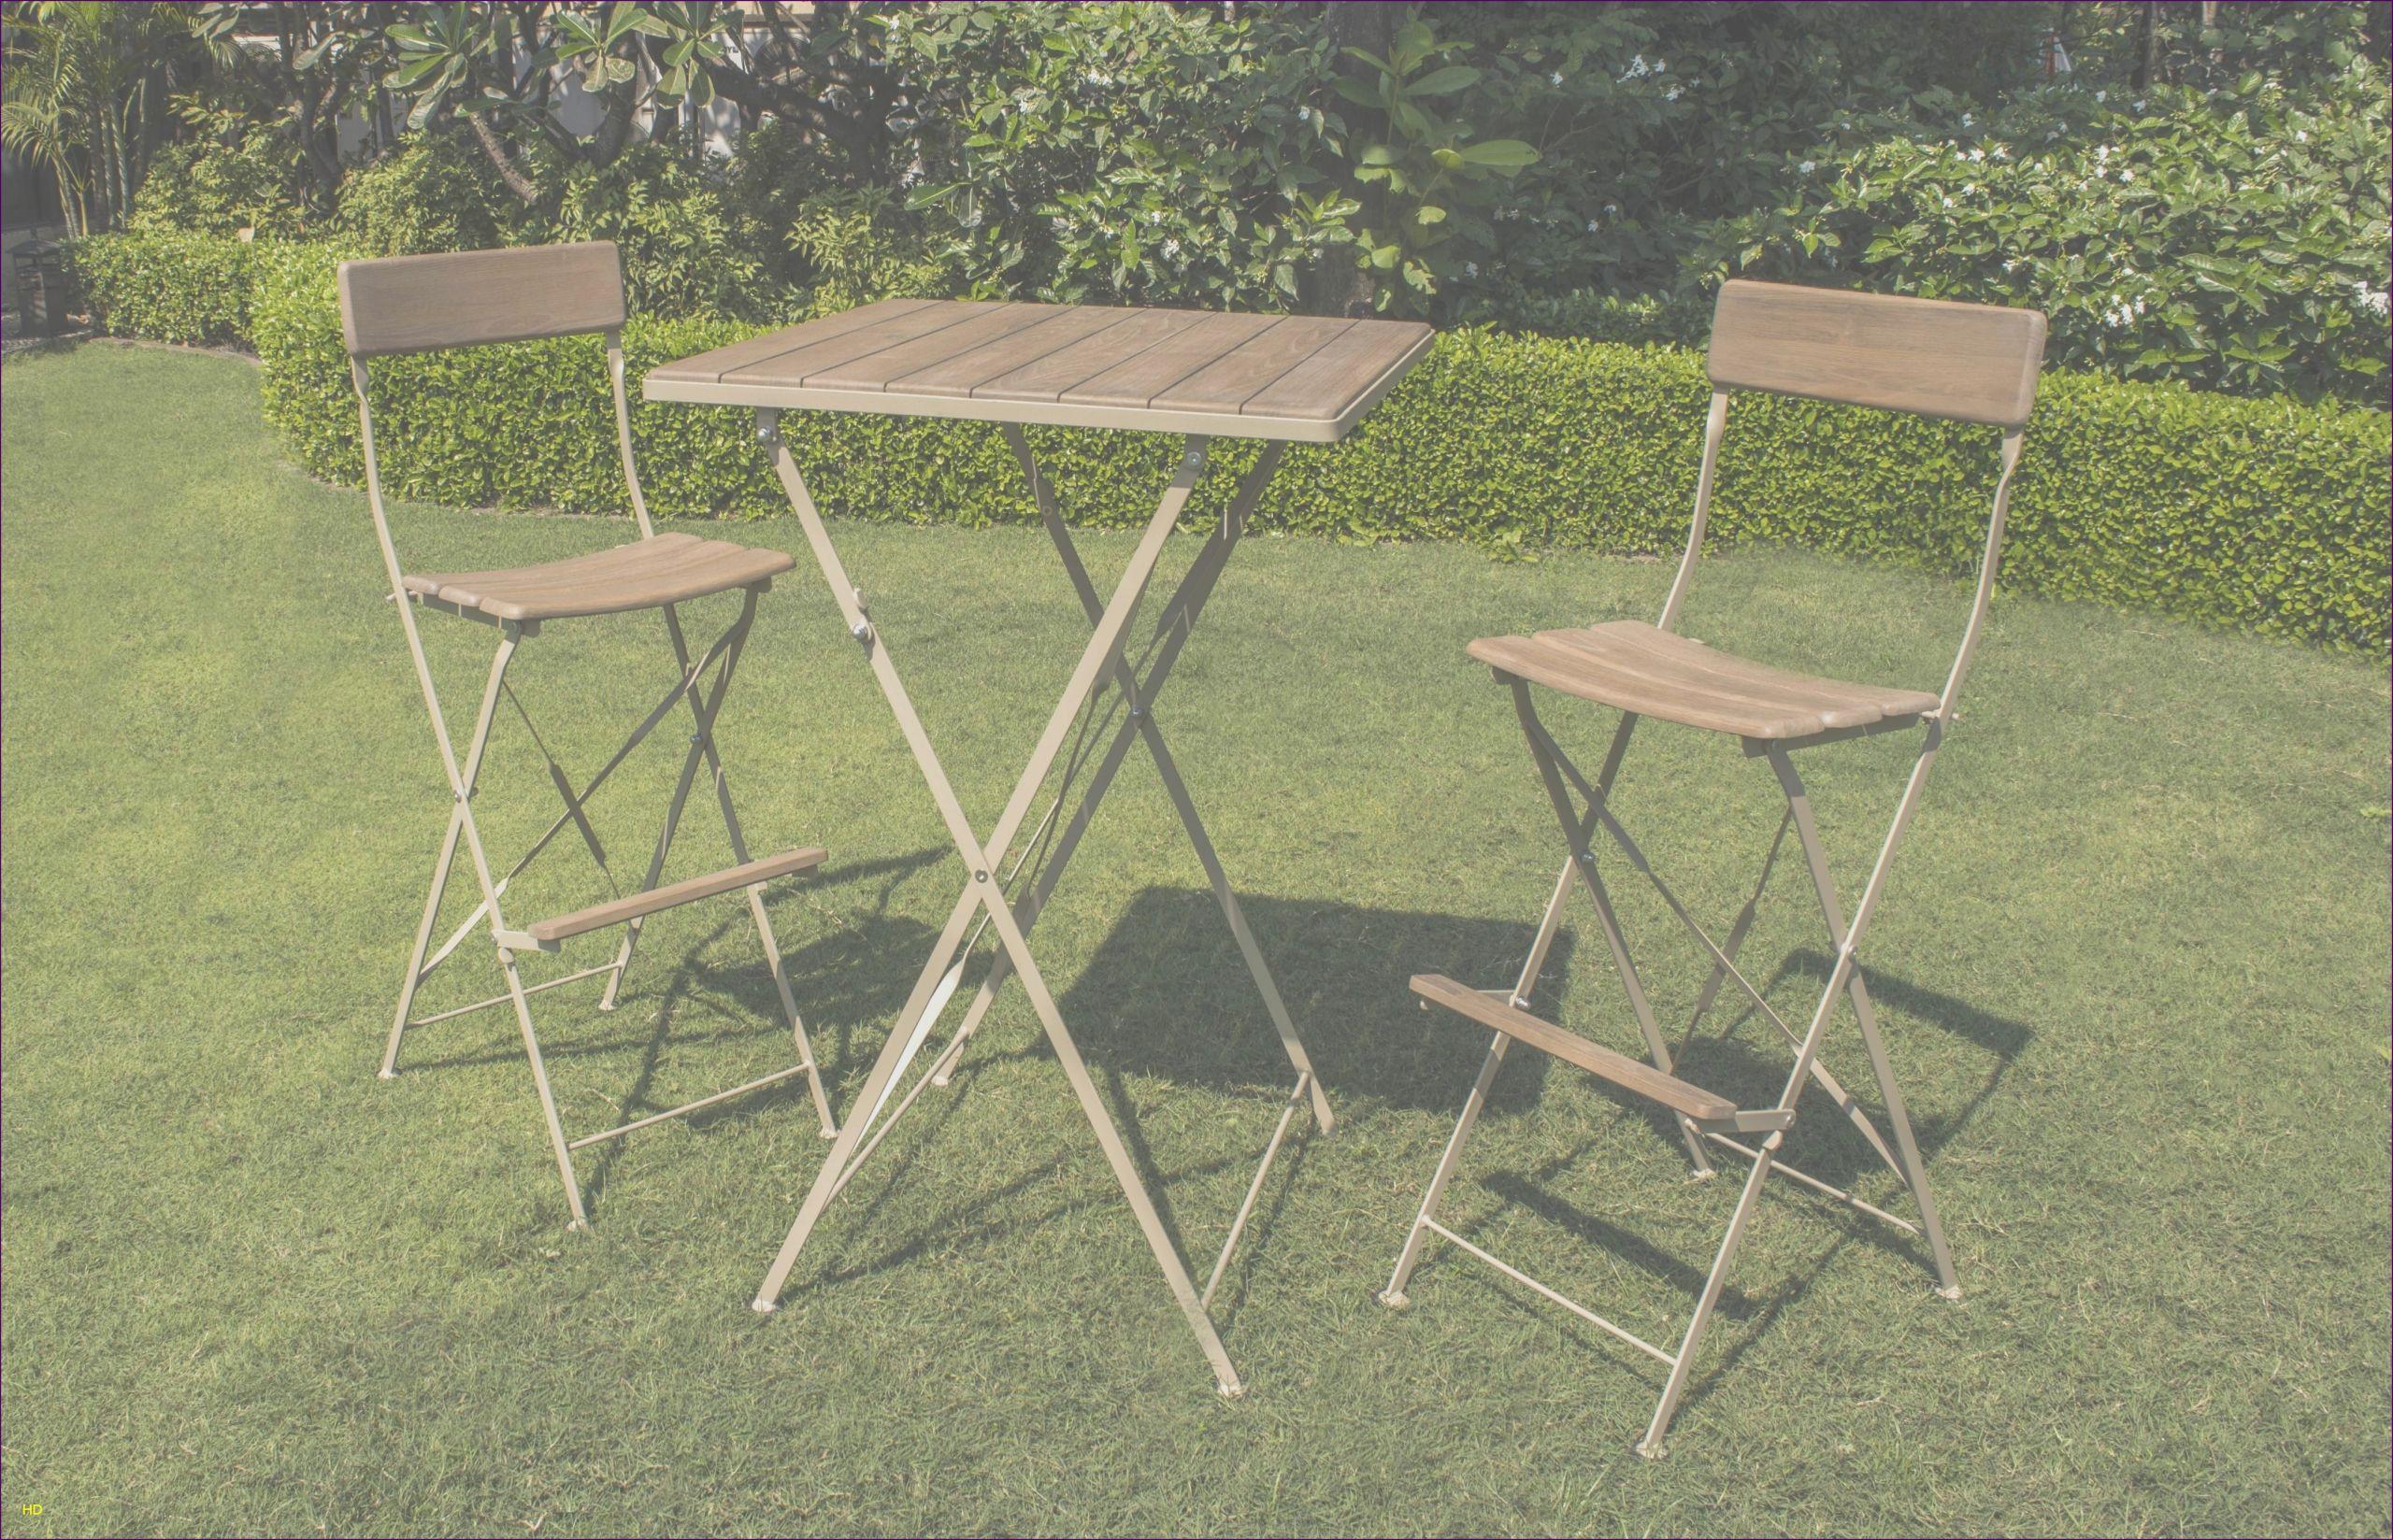 Table De Salon De Jardin Leclerc Génial Salon De Jardin ... tout Table De Jardin Magasin Leclerc